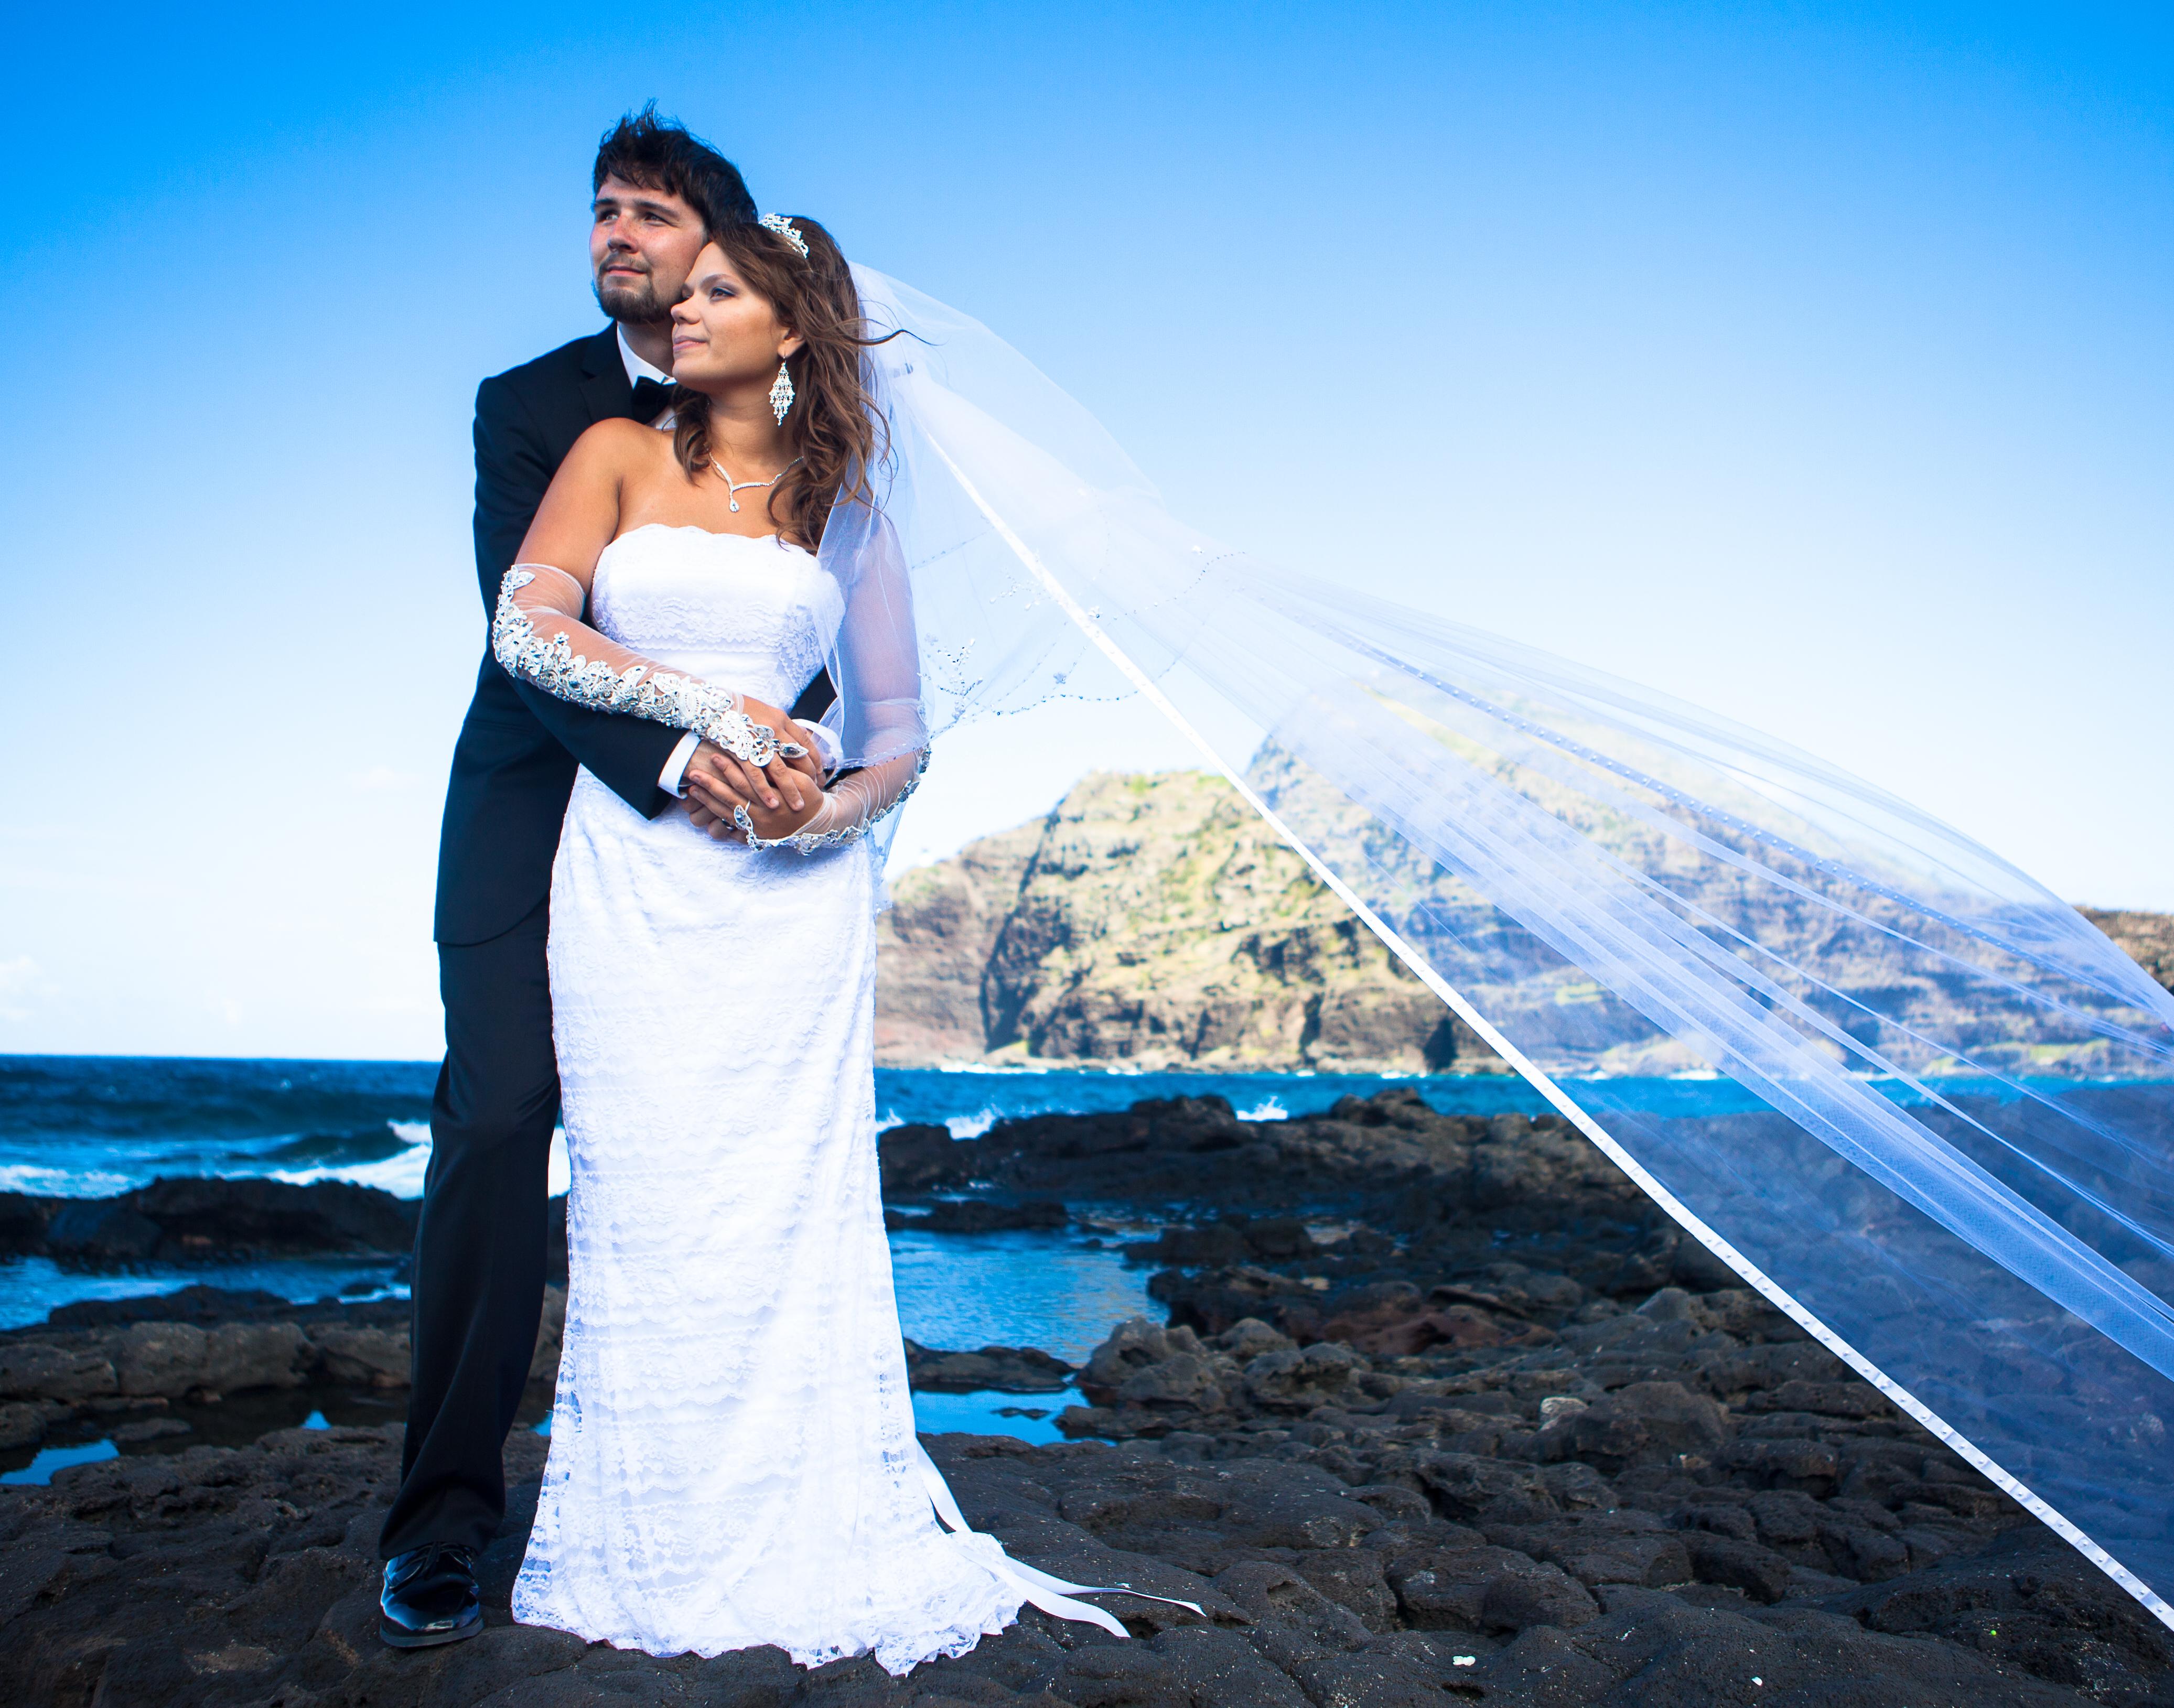 Hawaii Wedding Dove Release by alohaislandwedding.com -23